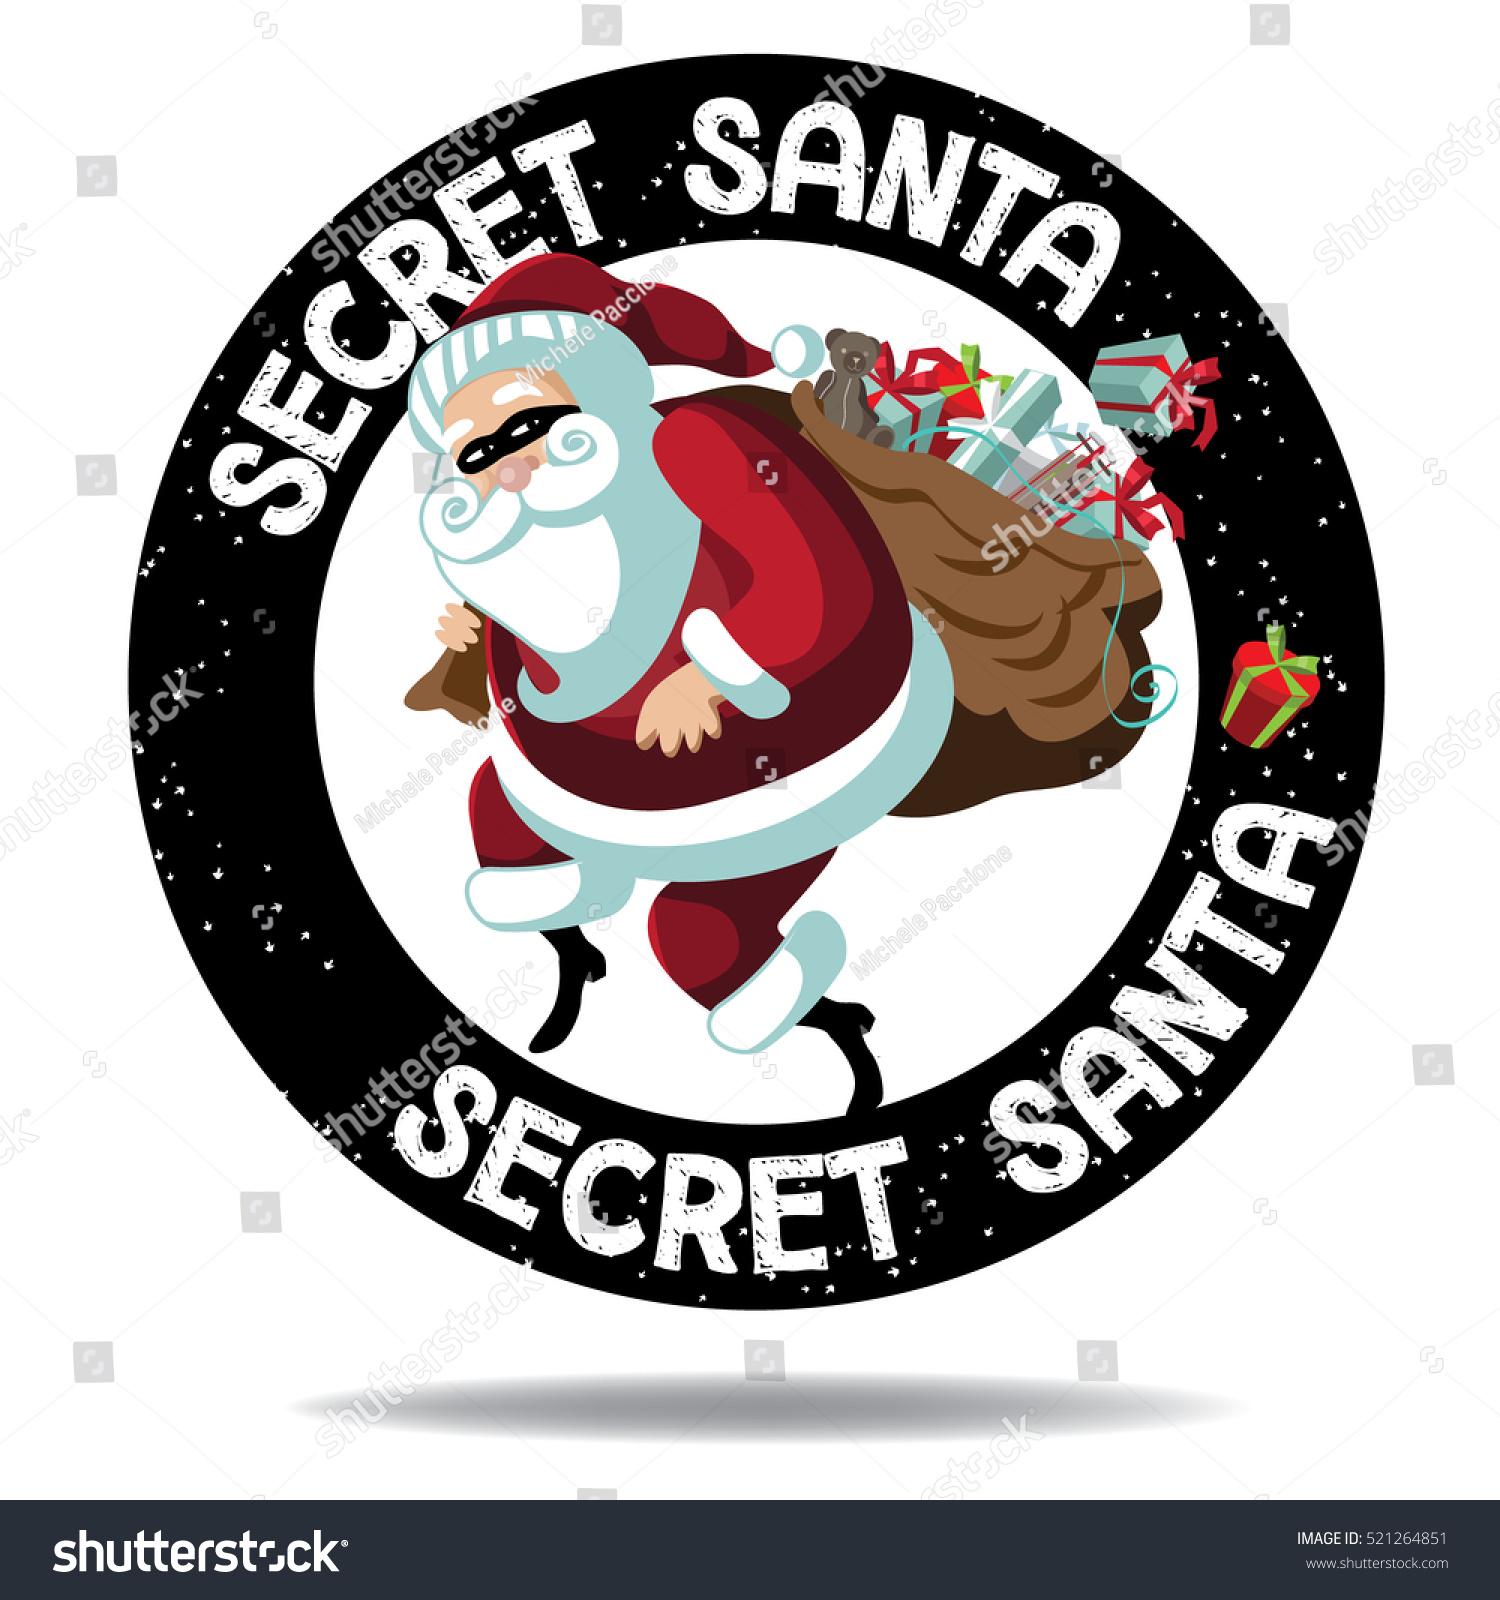 cartoon secret santa stamp icon santa stock vector royalty free rh shutterstock com Secret Santa Template secret santa images clip art